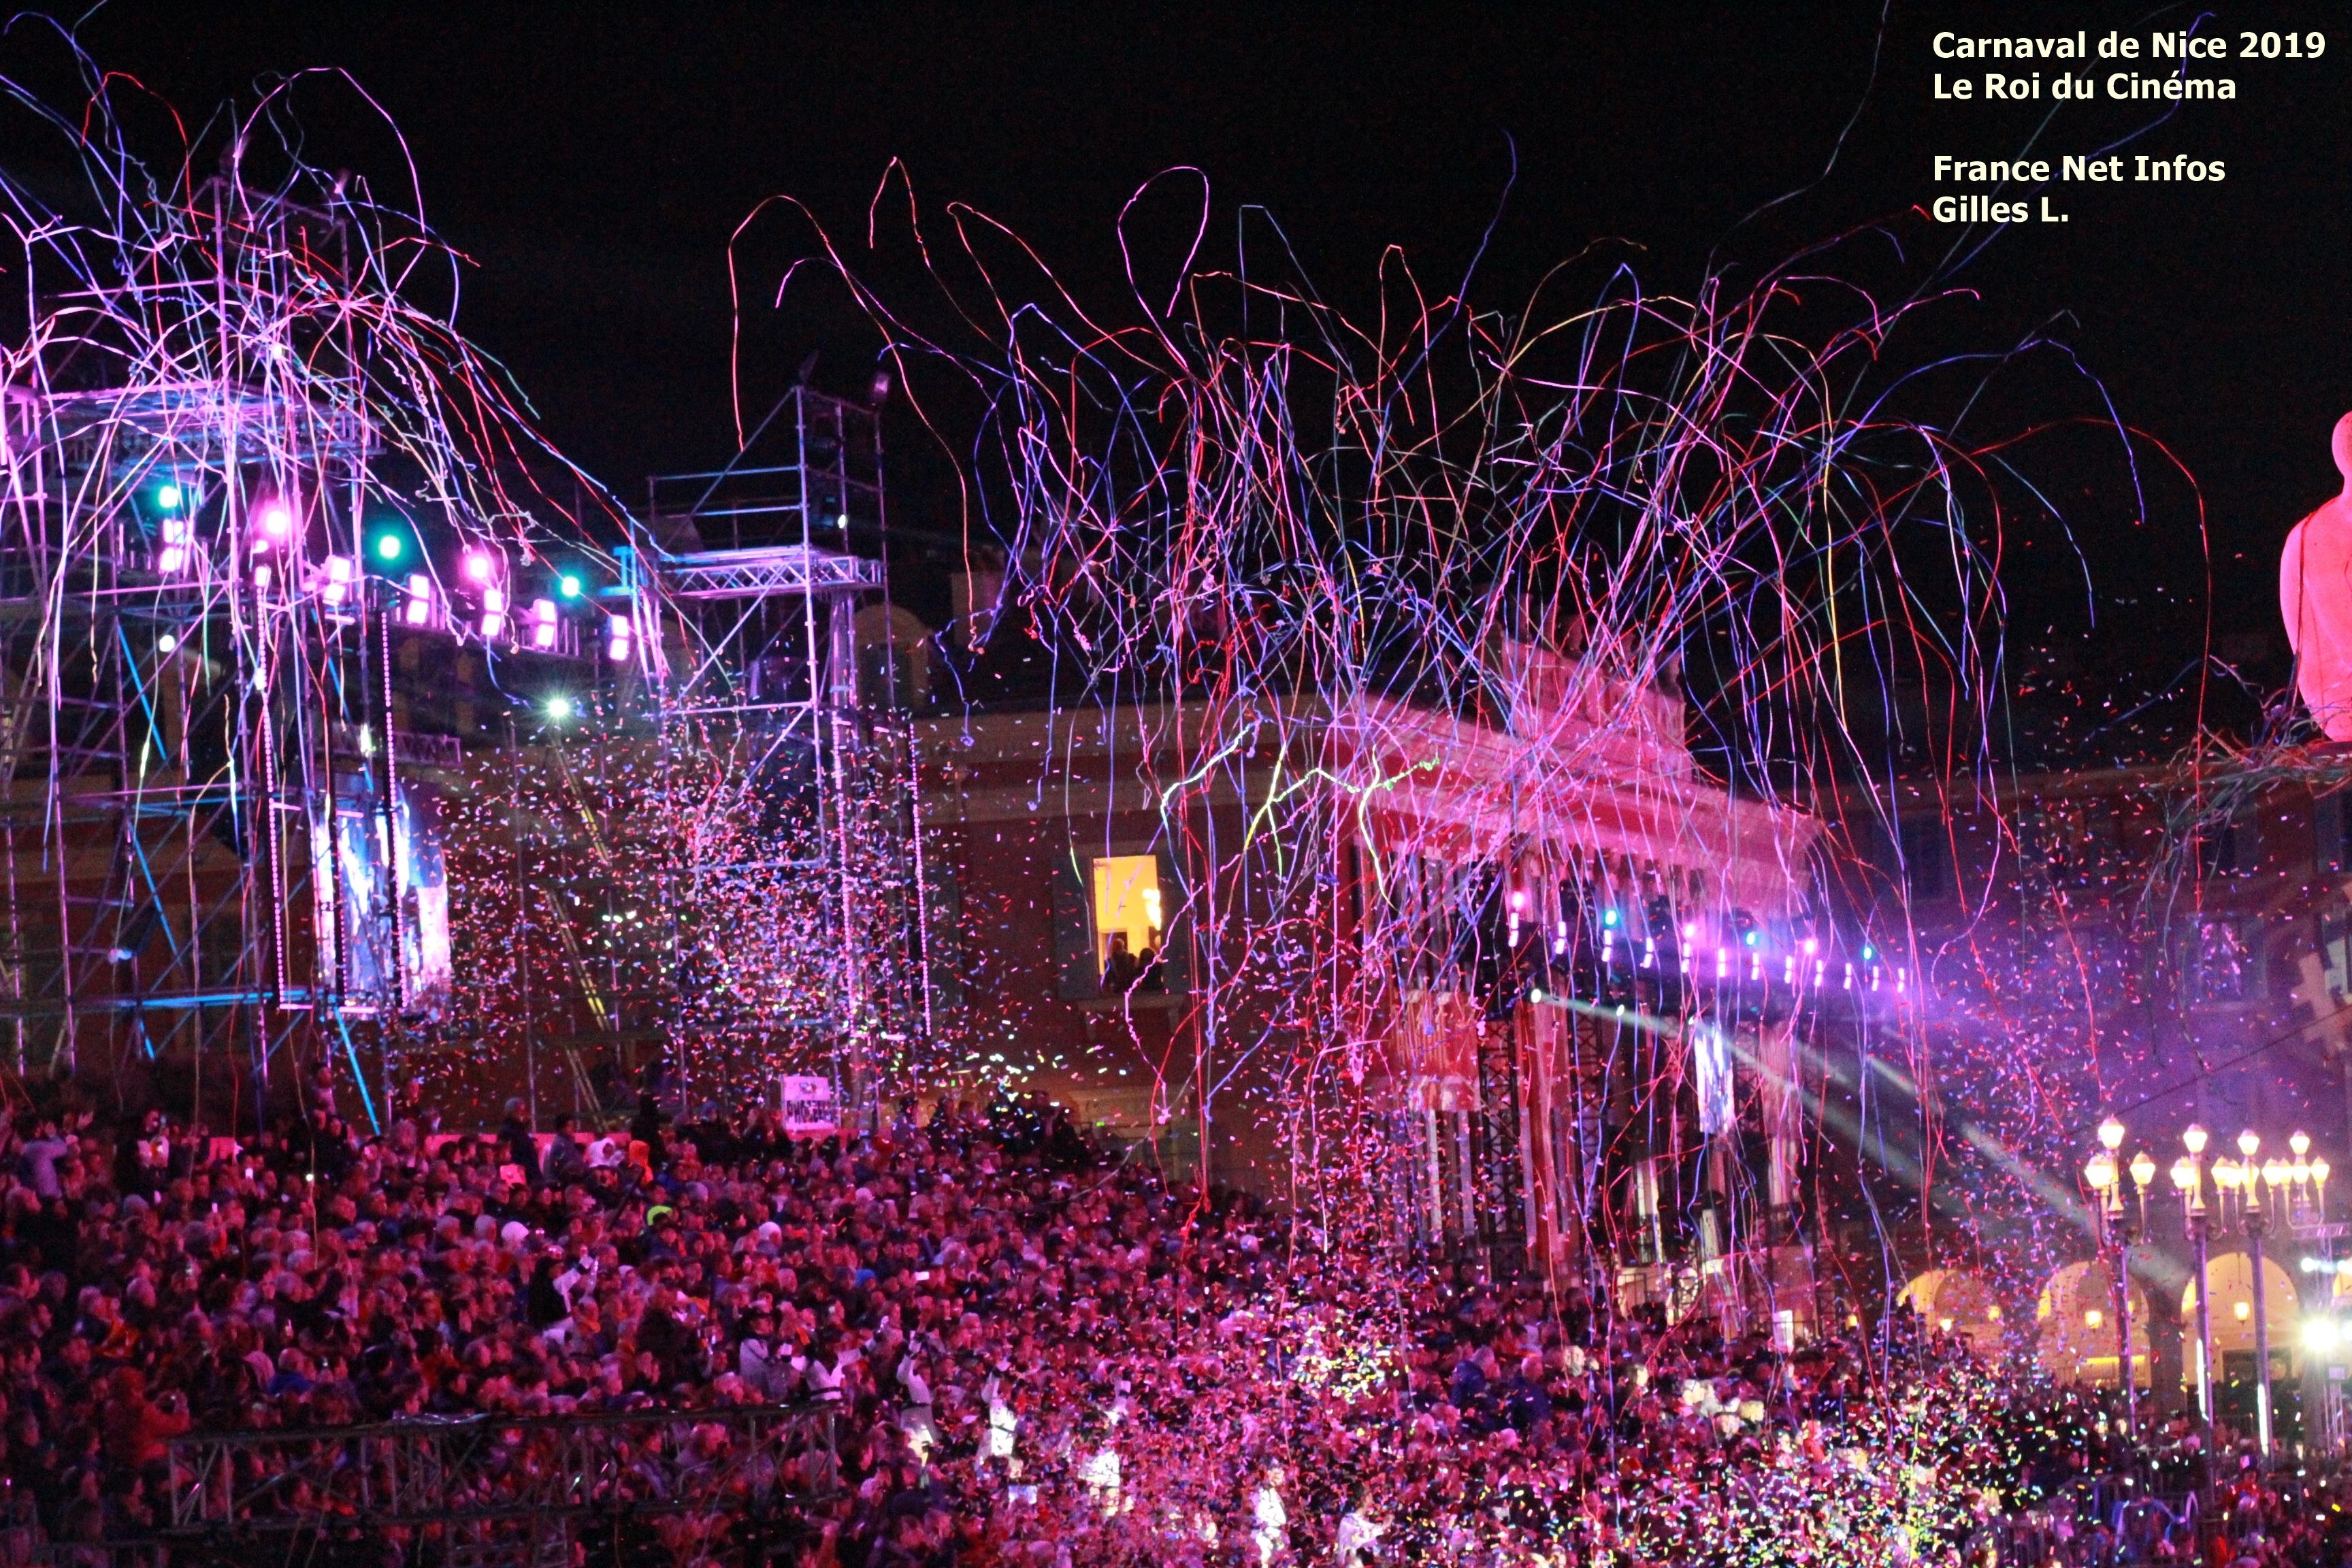 Carnaval Nice 2019.jpeg0540